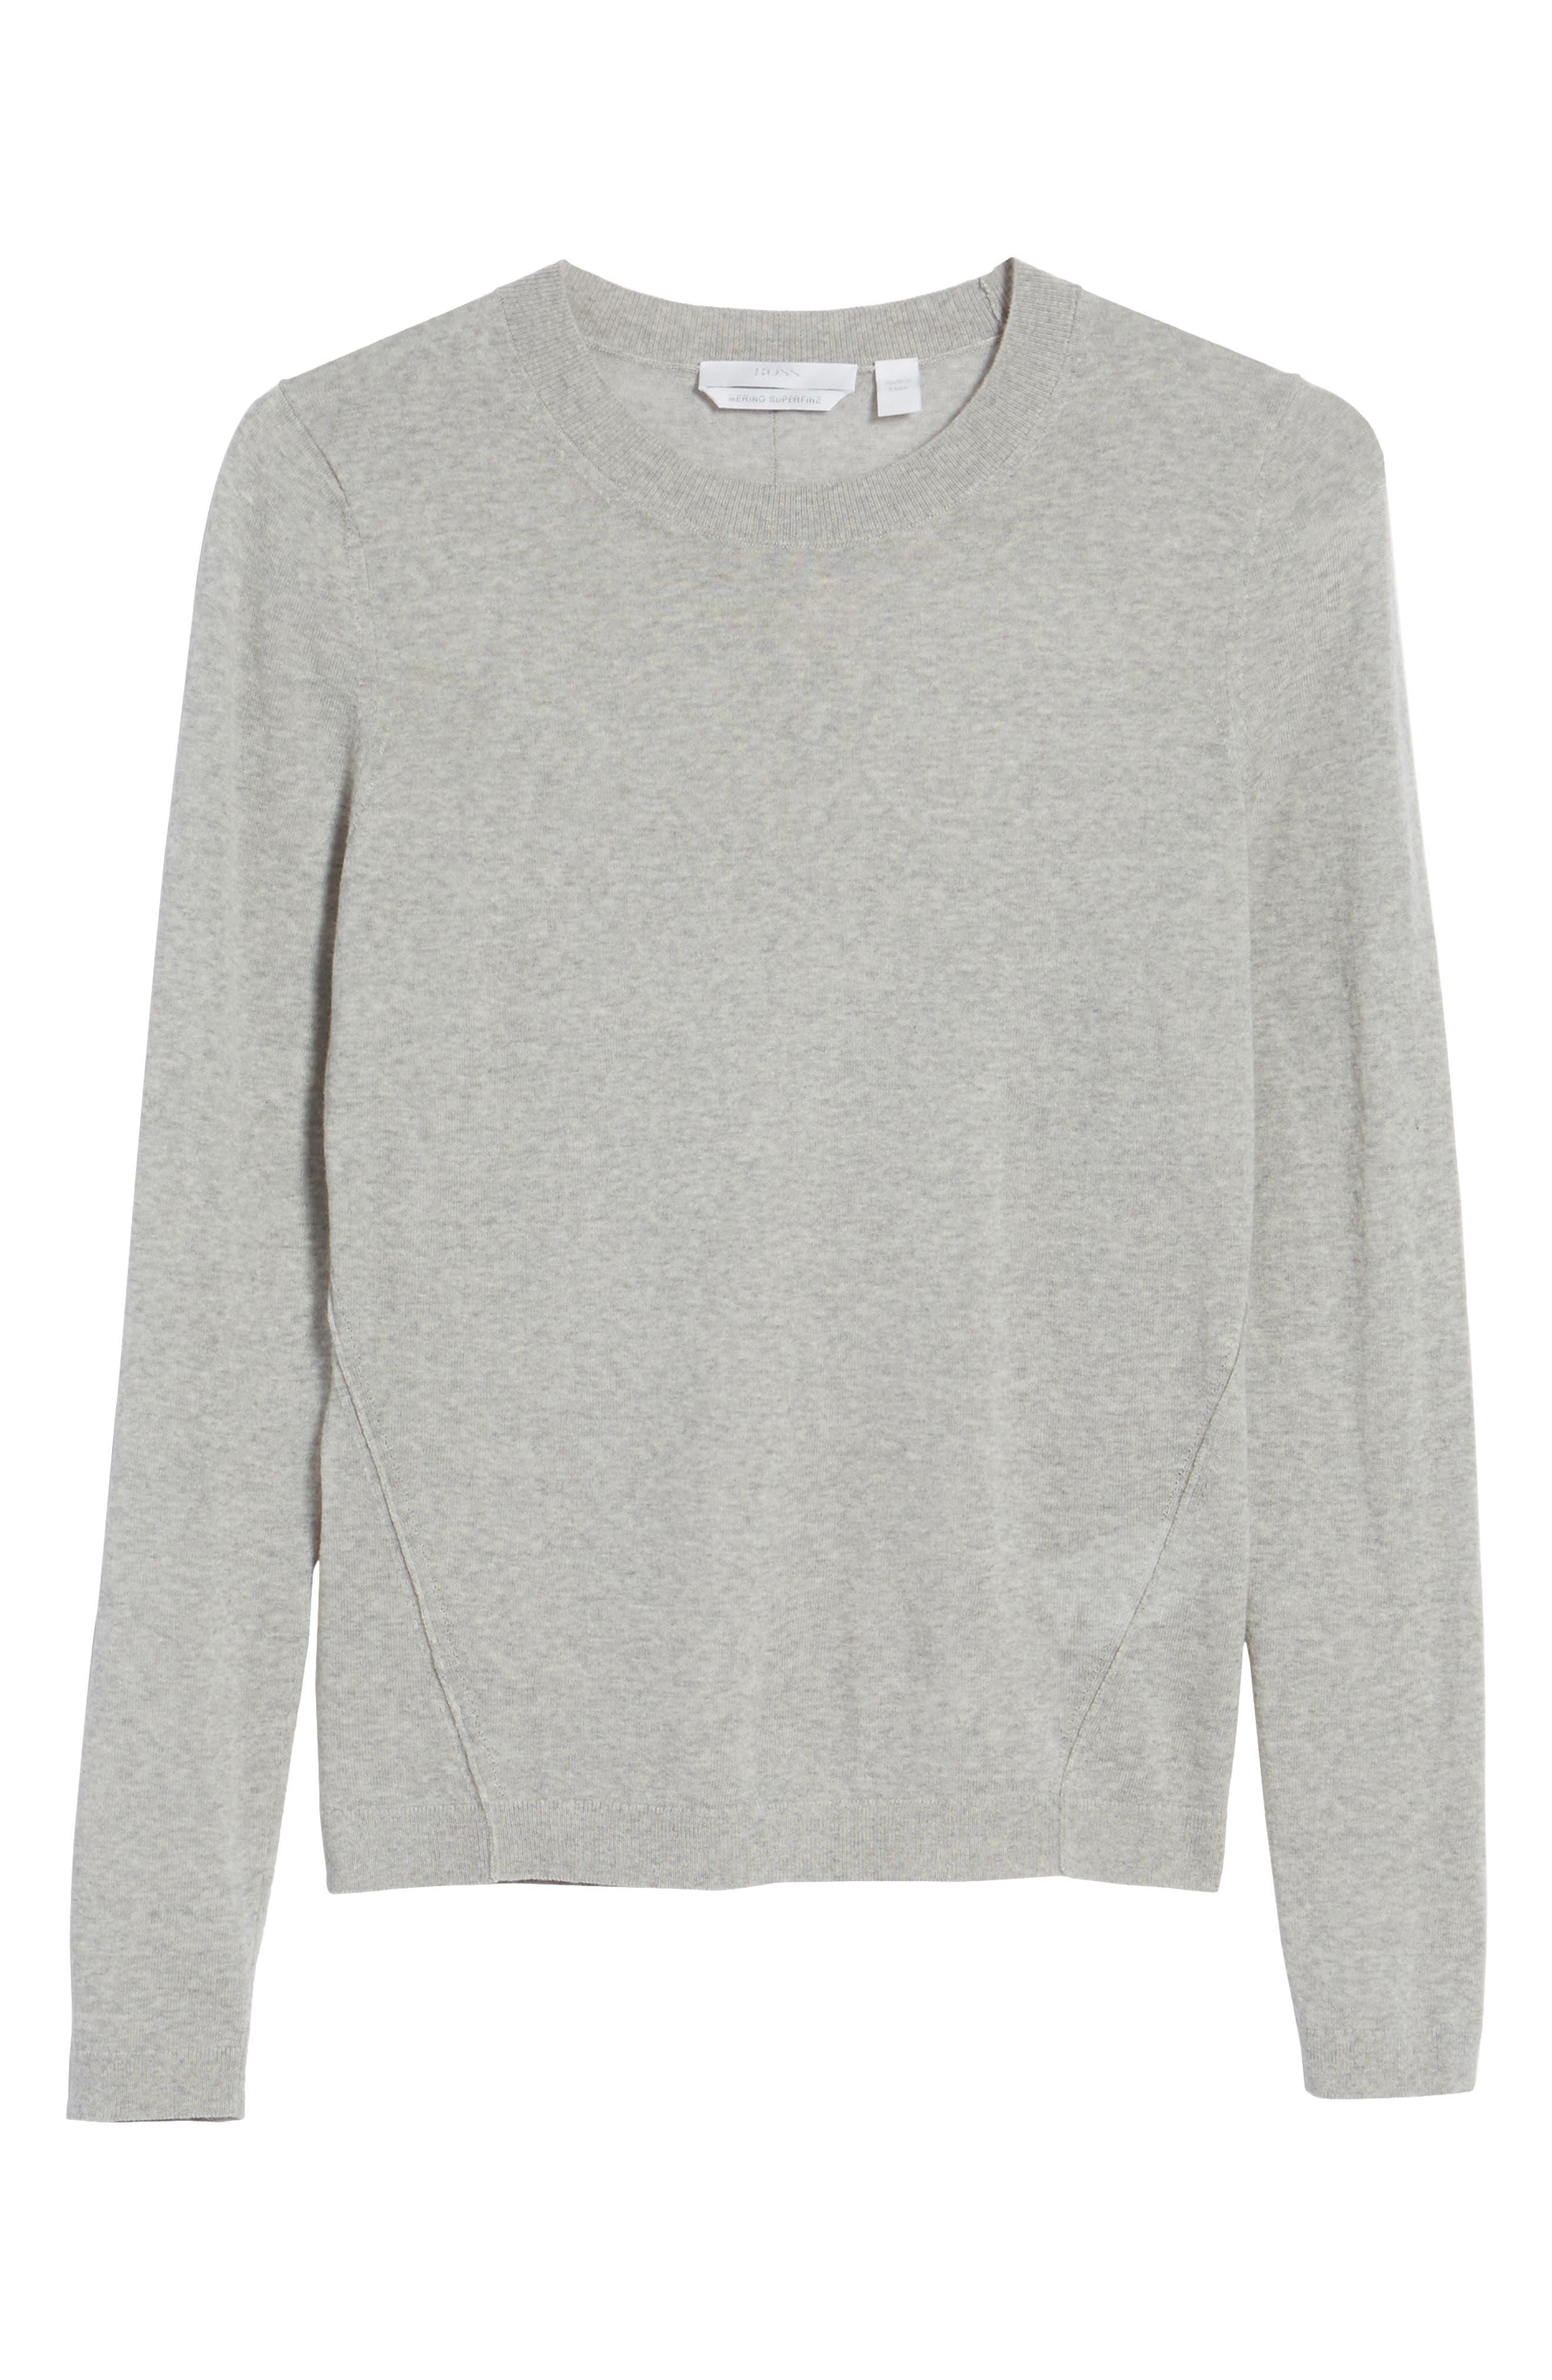 Fayme Wool Crewneck Sweater,                             Alternate thumbnail 6, color,                             Cozy Grey Melange